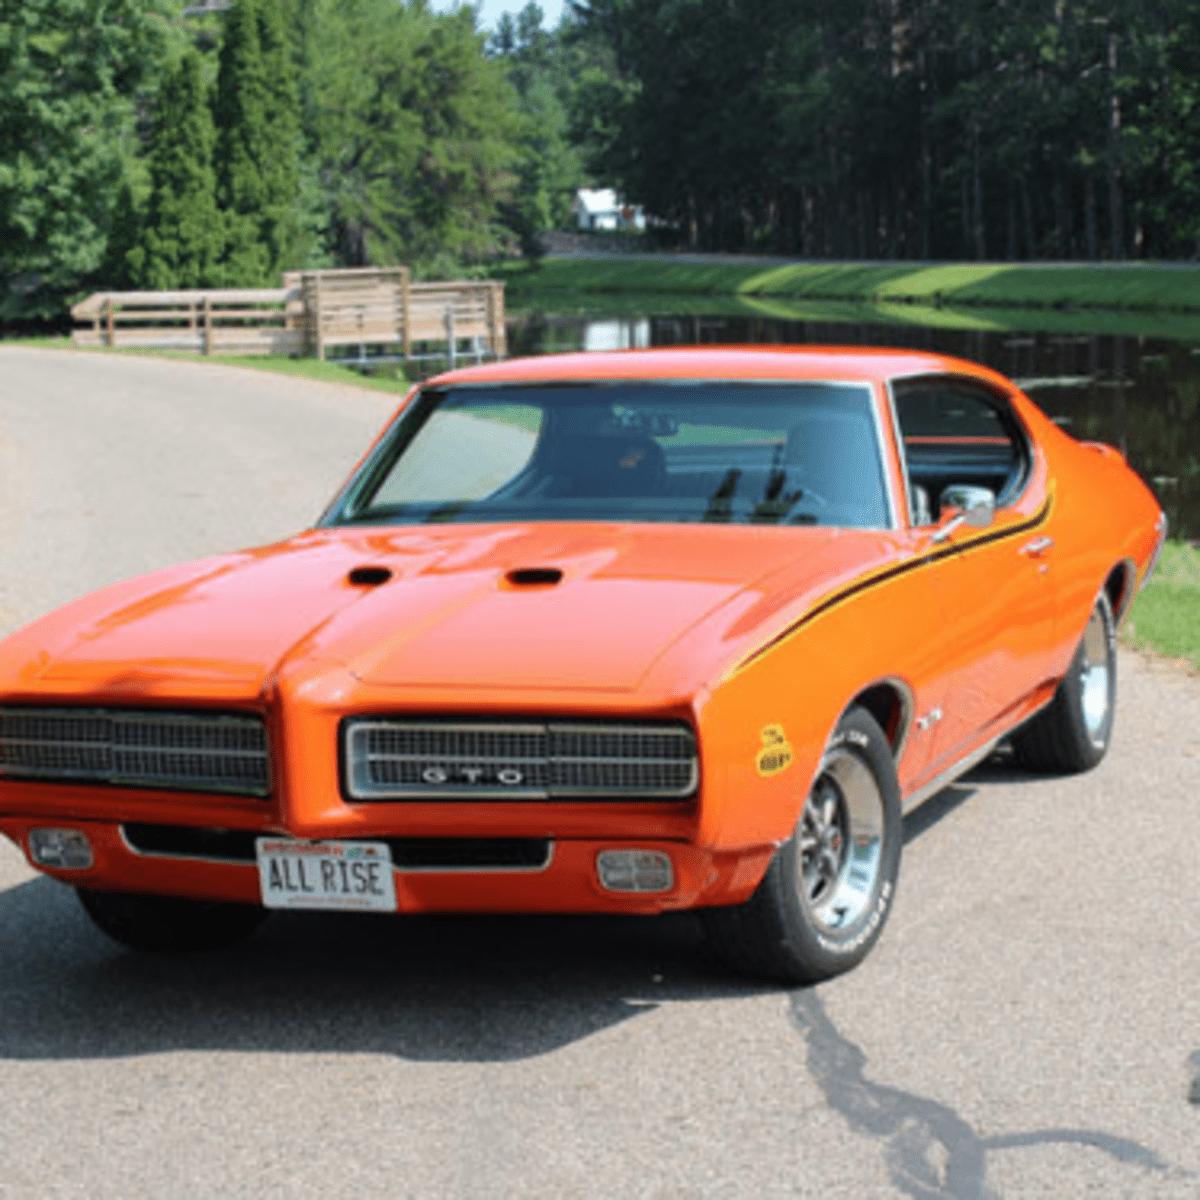 Car Of The Week 1969 Pontiac Gto Judge Old Cars Weekly